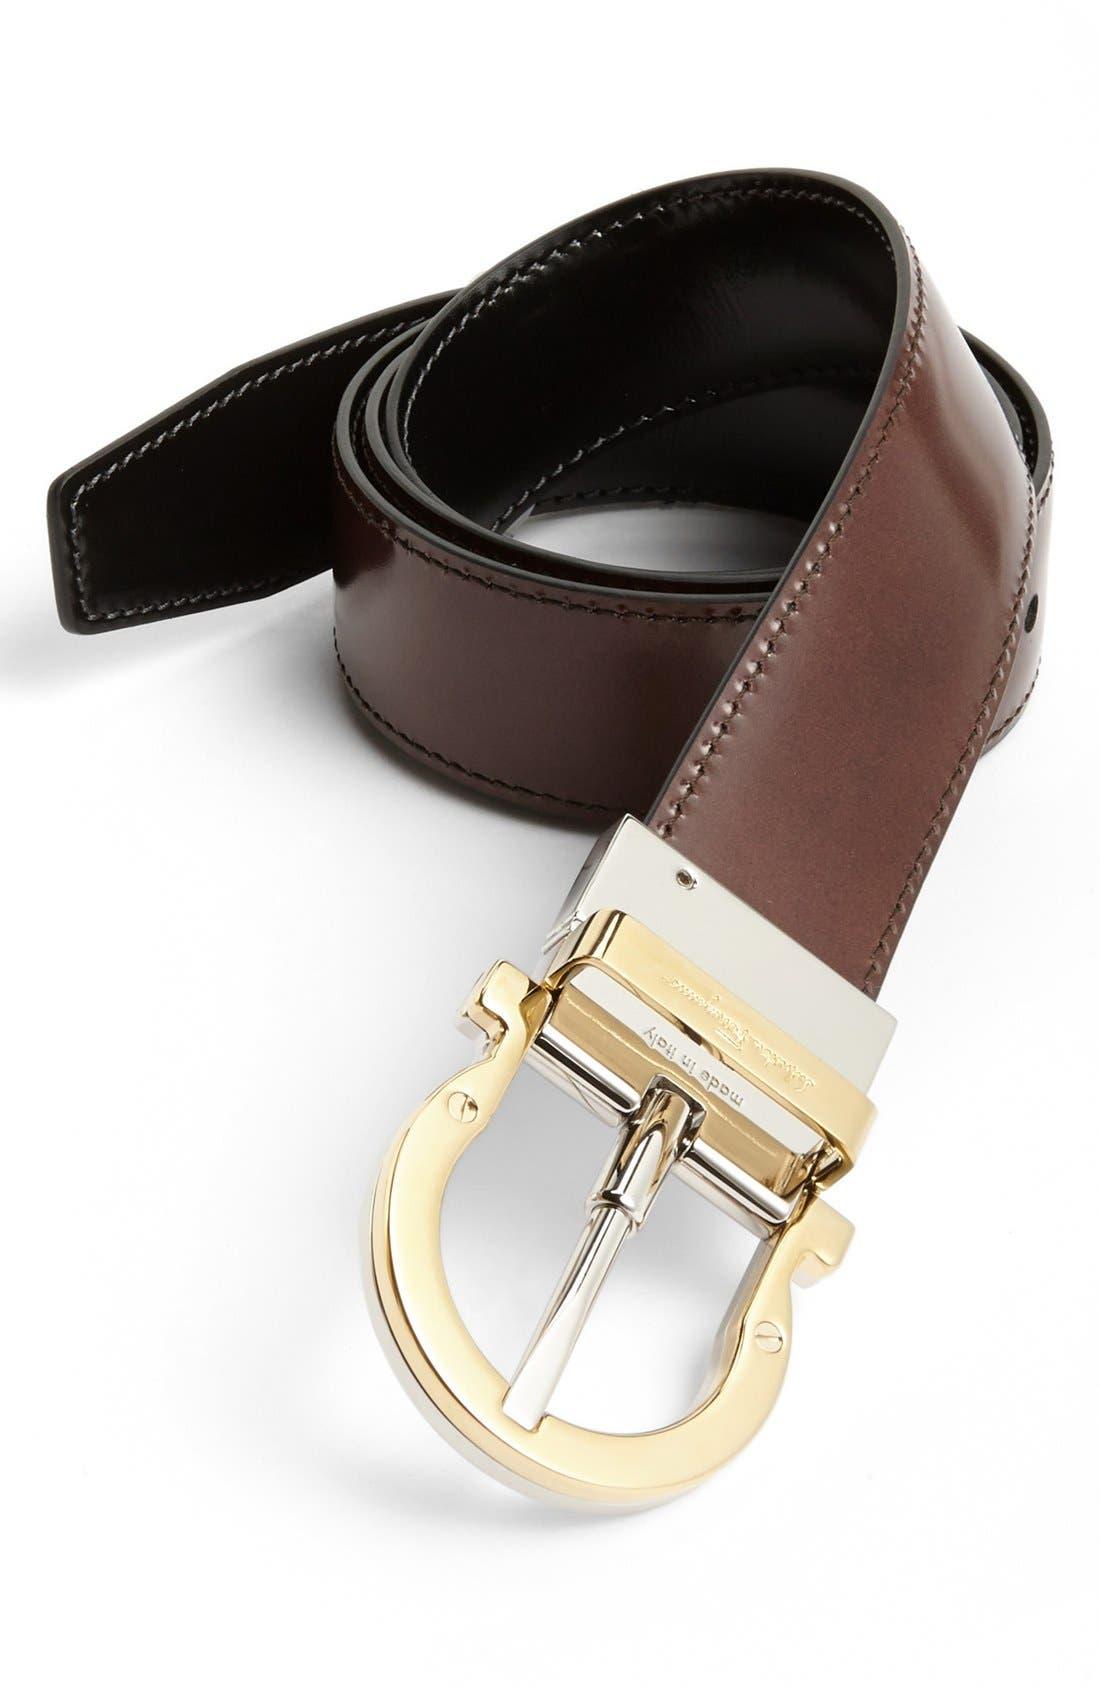 Alternate Image 1 Selected - Salvatore Ferragamo 'Twirl' Reversible Belt